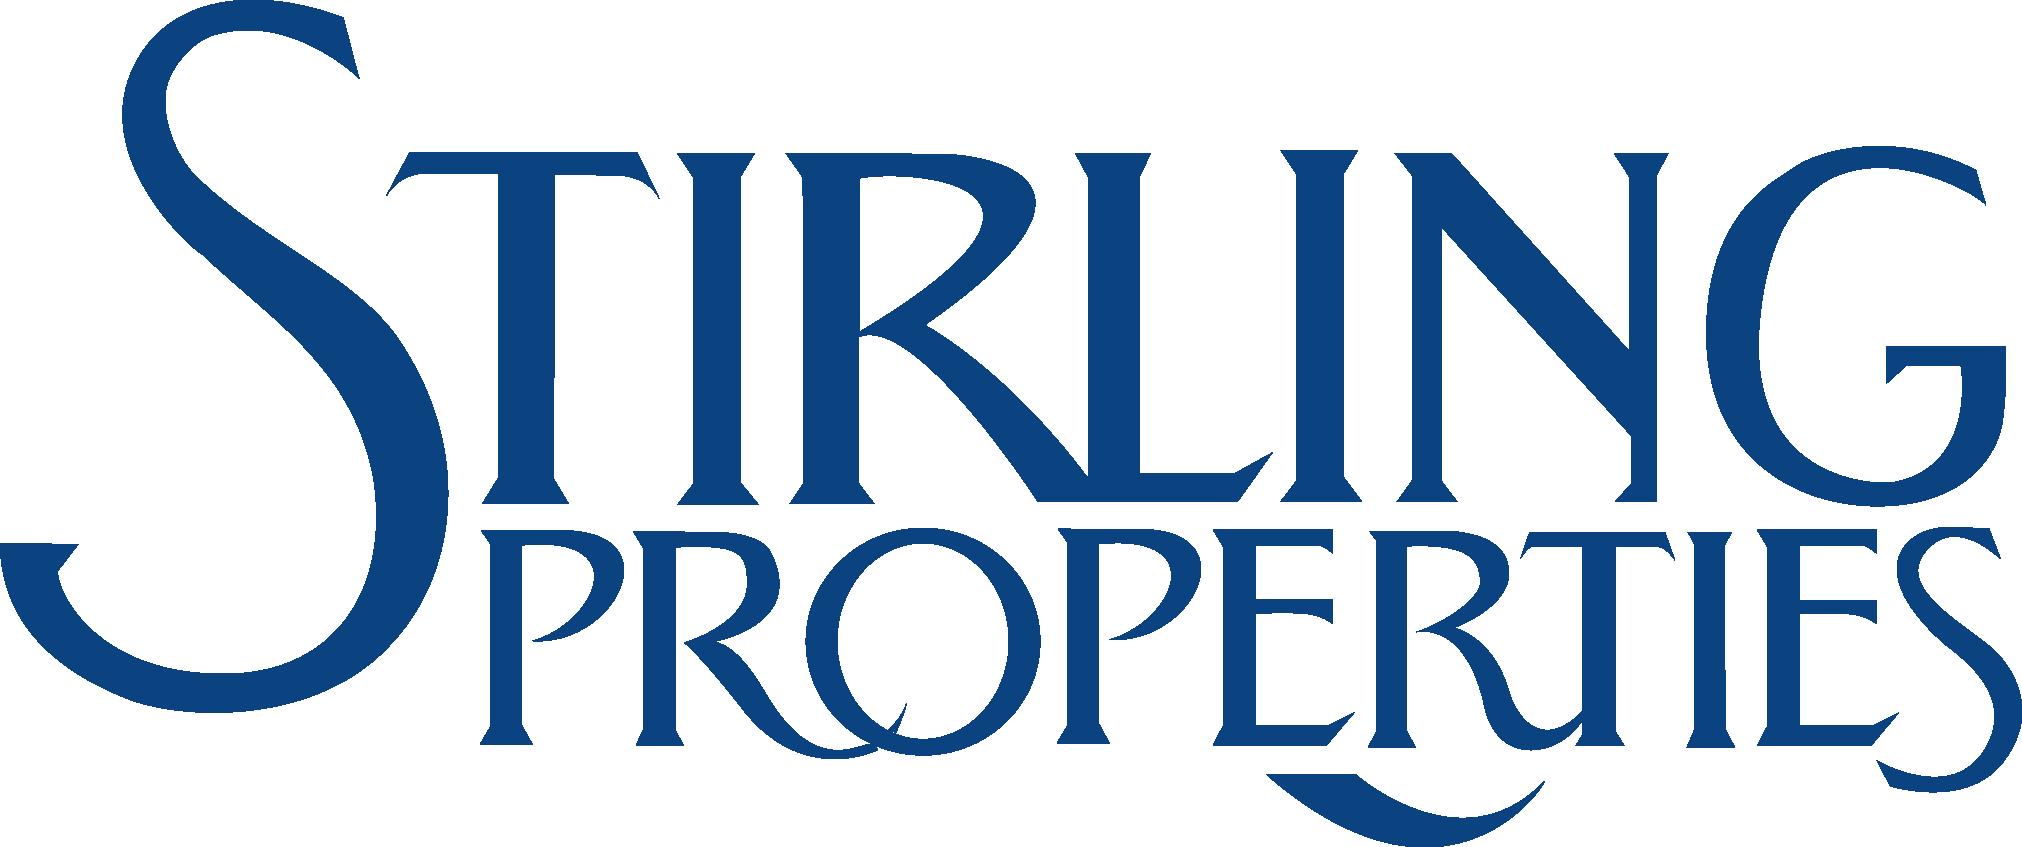 Stirling Properties, LLC logo